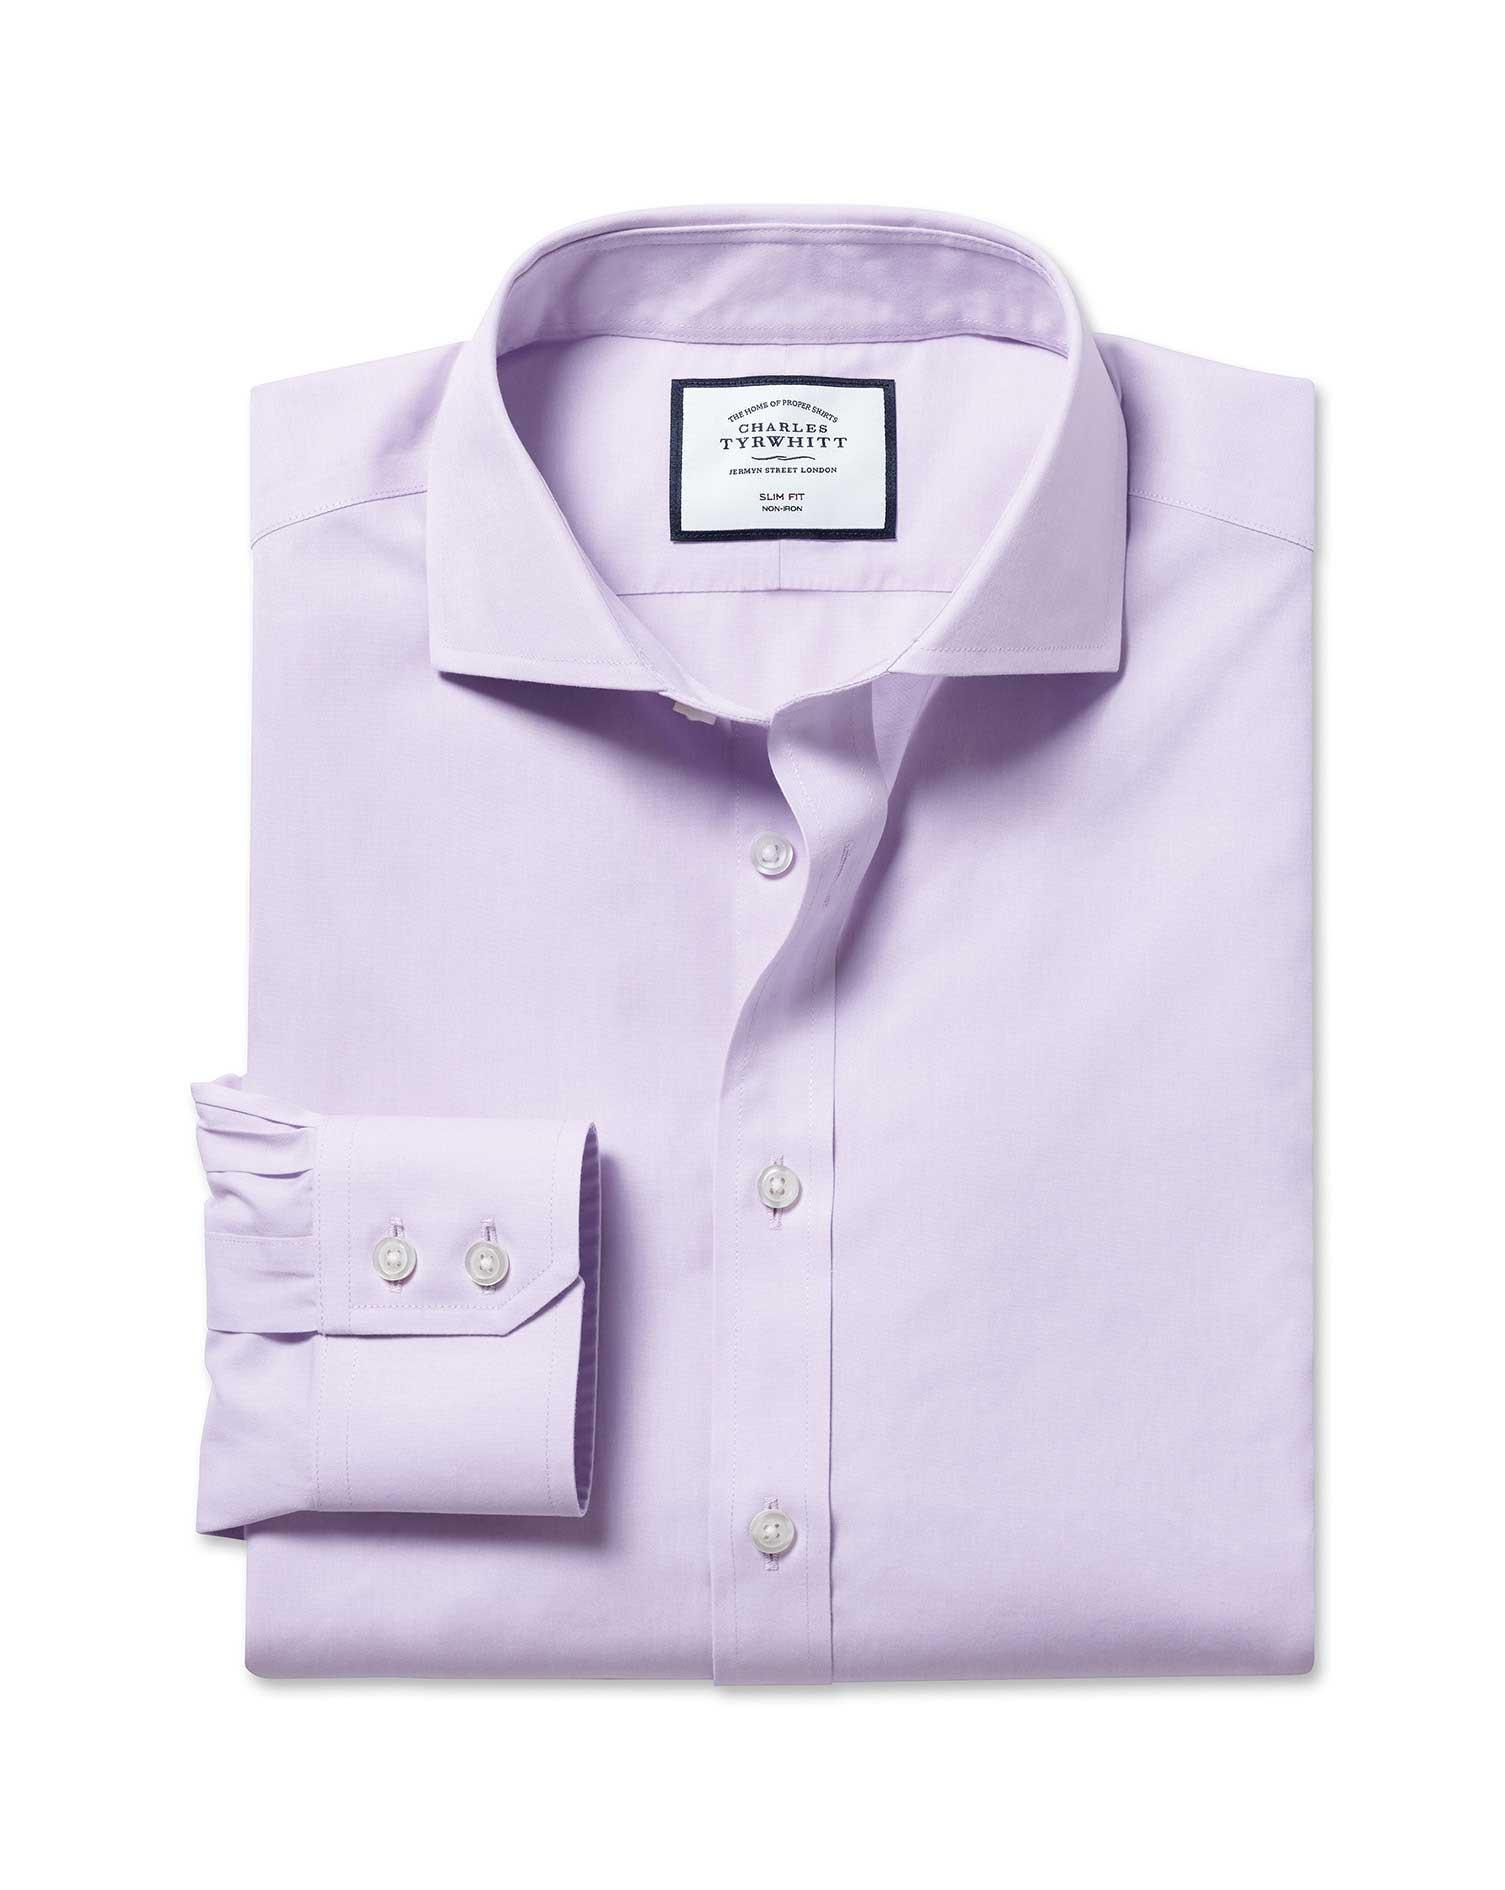 Slim Fit Non-Iron Cutaway Collar Poplin Lilac Cotton Formal Shirt Single Cuff Size 18/36 by Charles